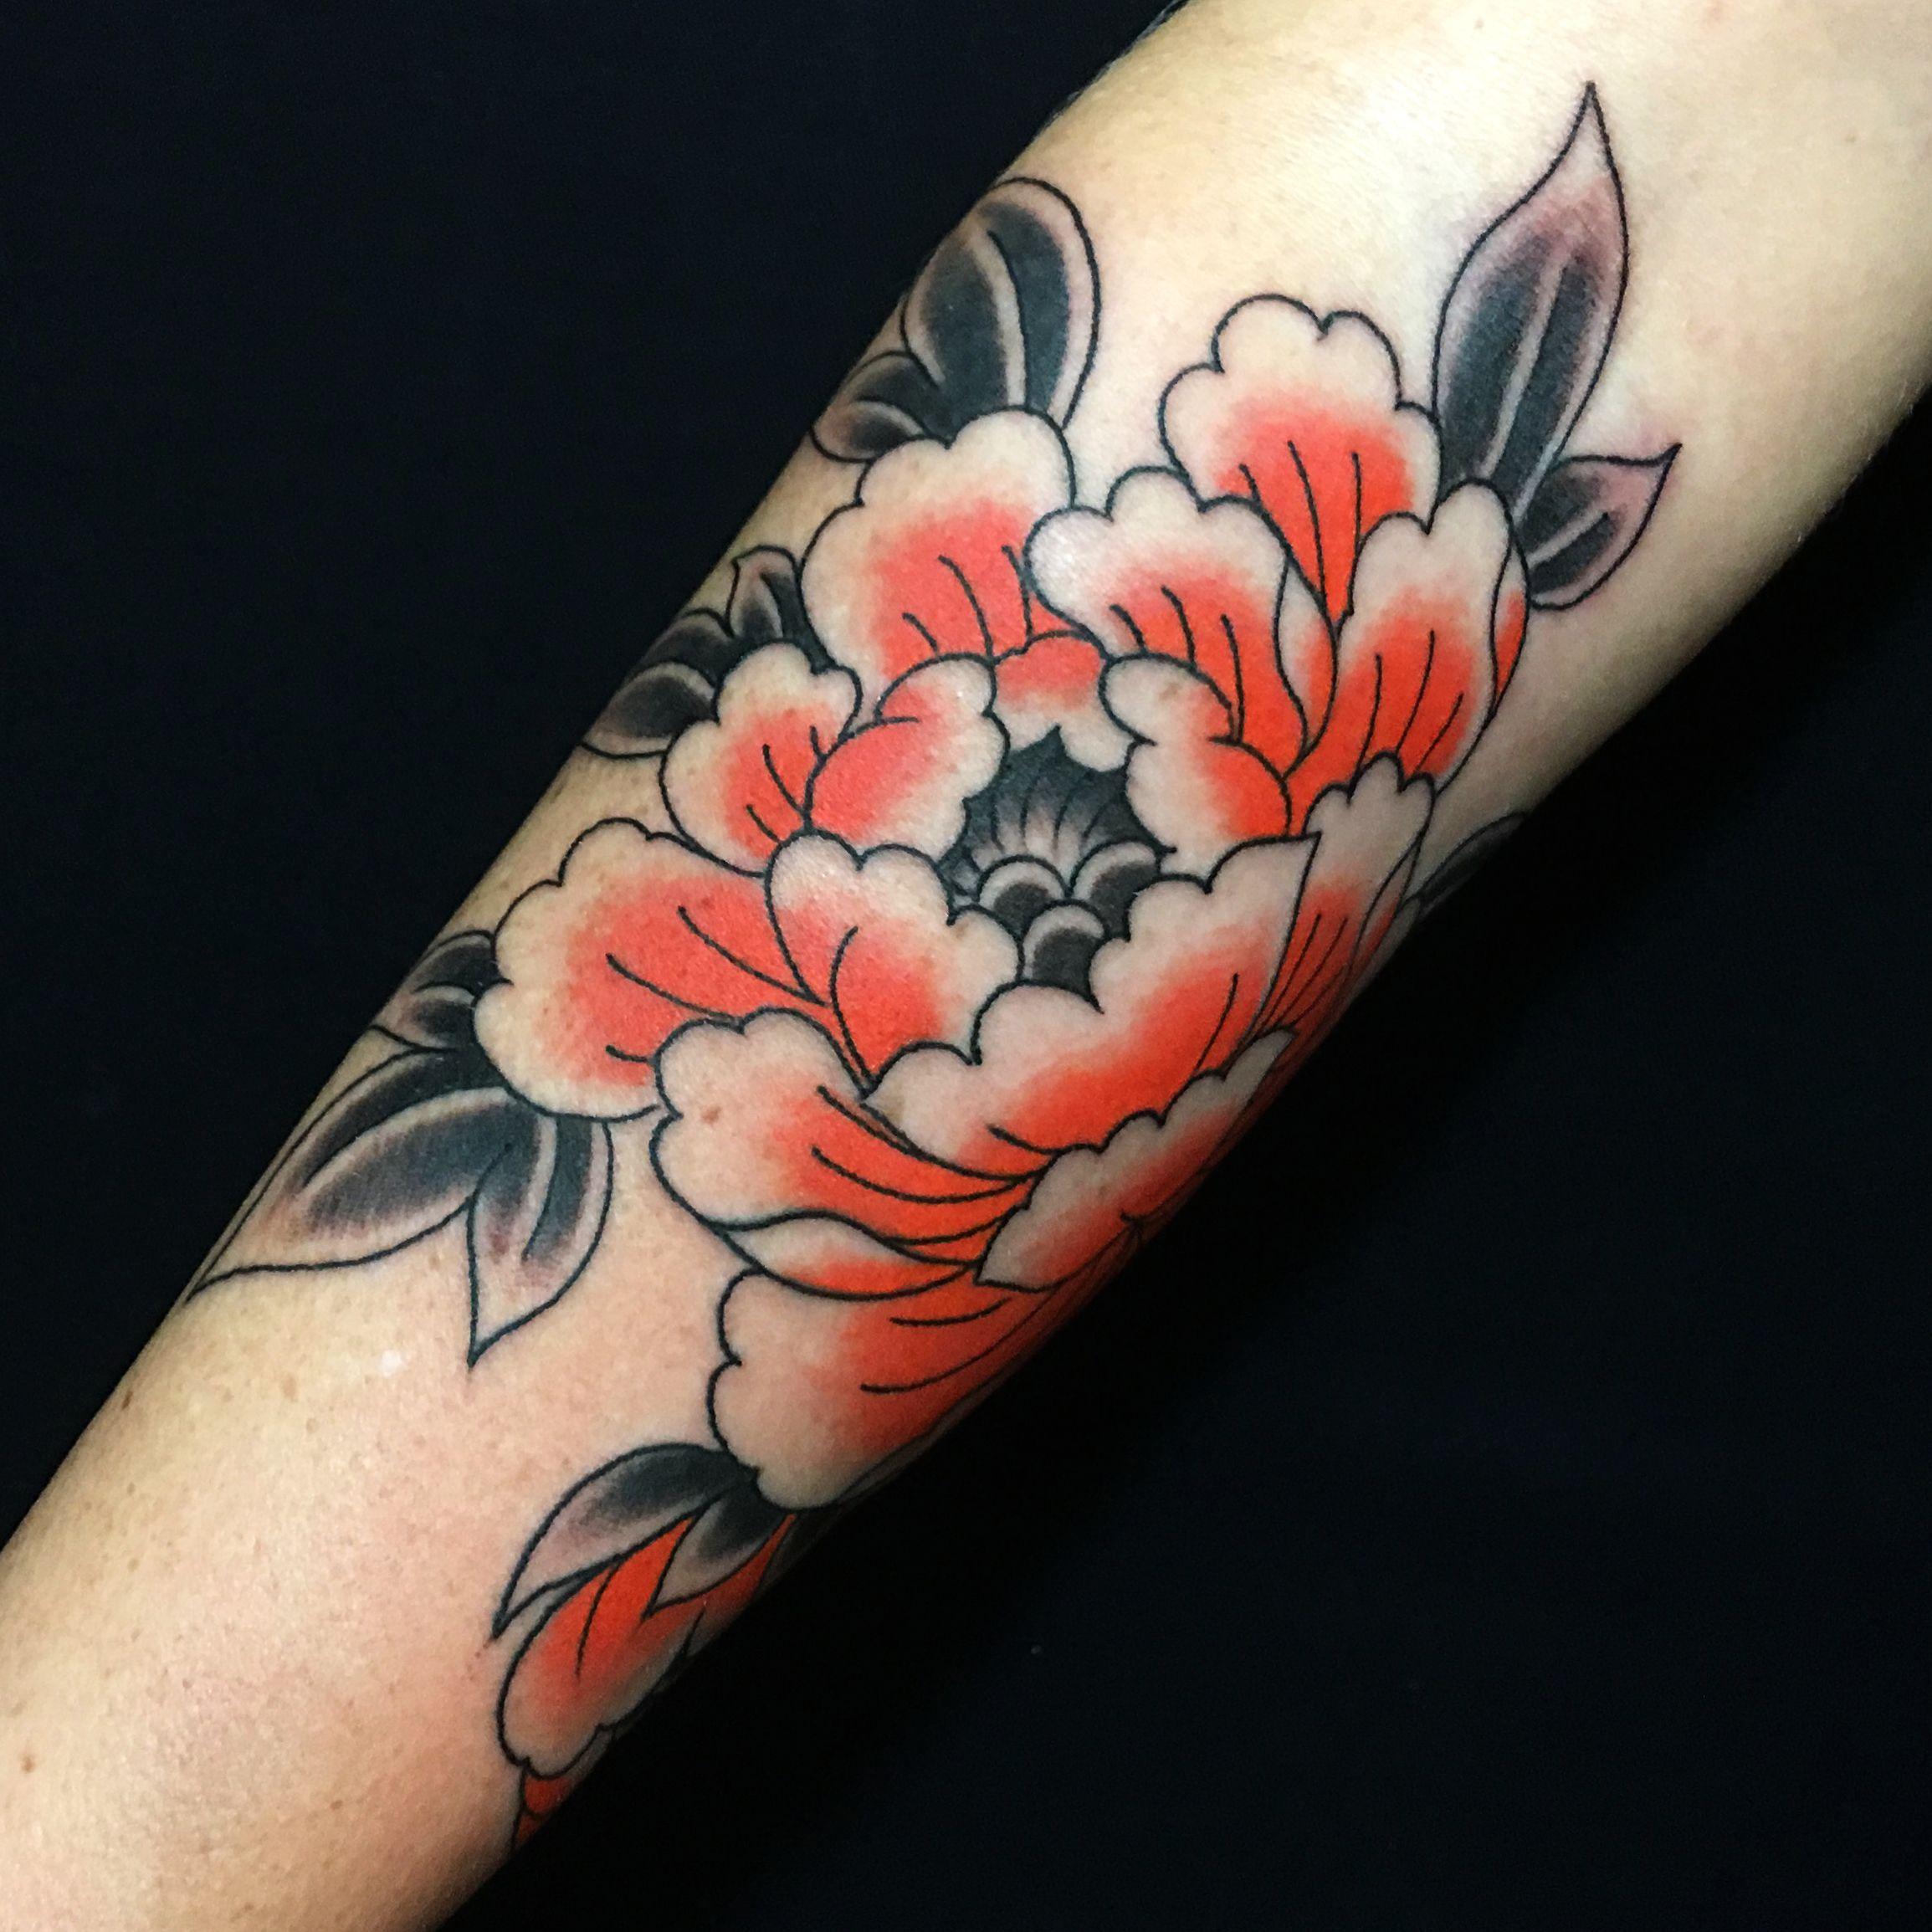 Peony - Japanese tattoo by Caio Piñeiro | tattoos | Pinterest ...